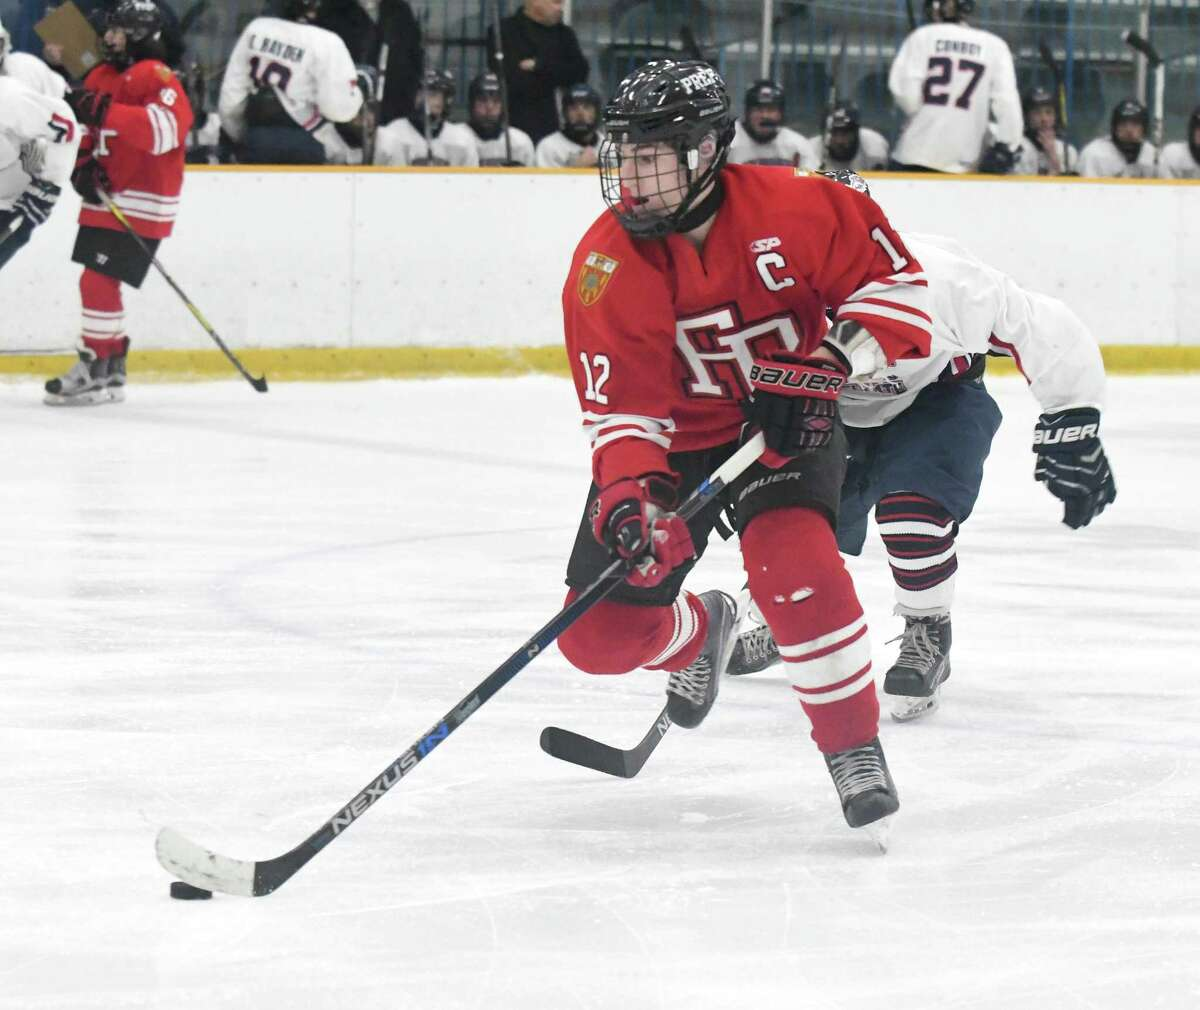 Ryan Eckert and his Fairfield Prep teammates host Ridgefield on Wednesday night at 6 at Bridgeport's Wonderland of Ice.